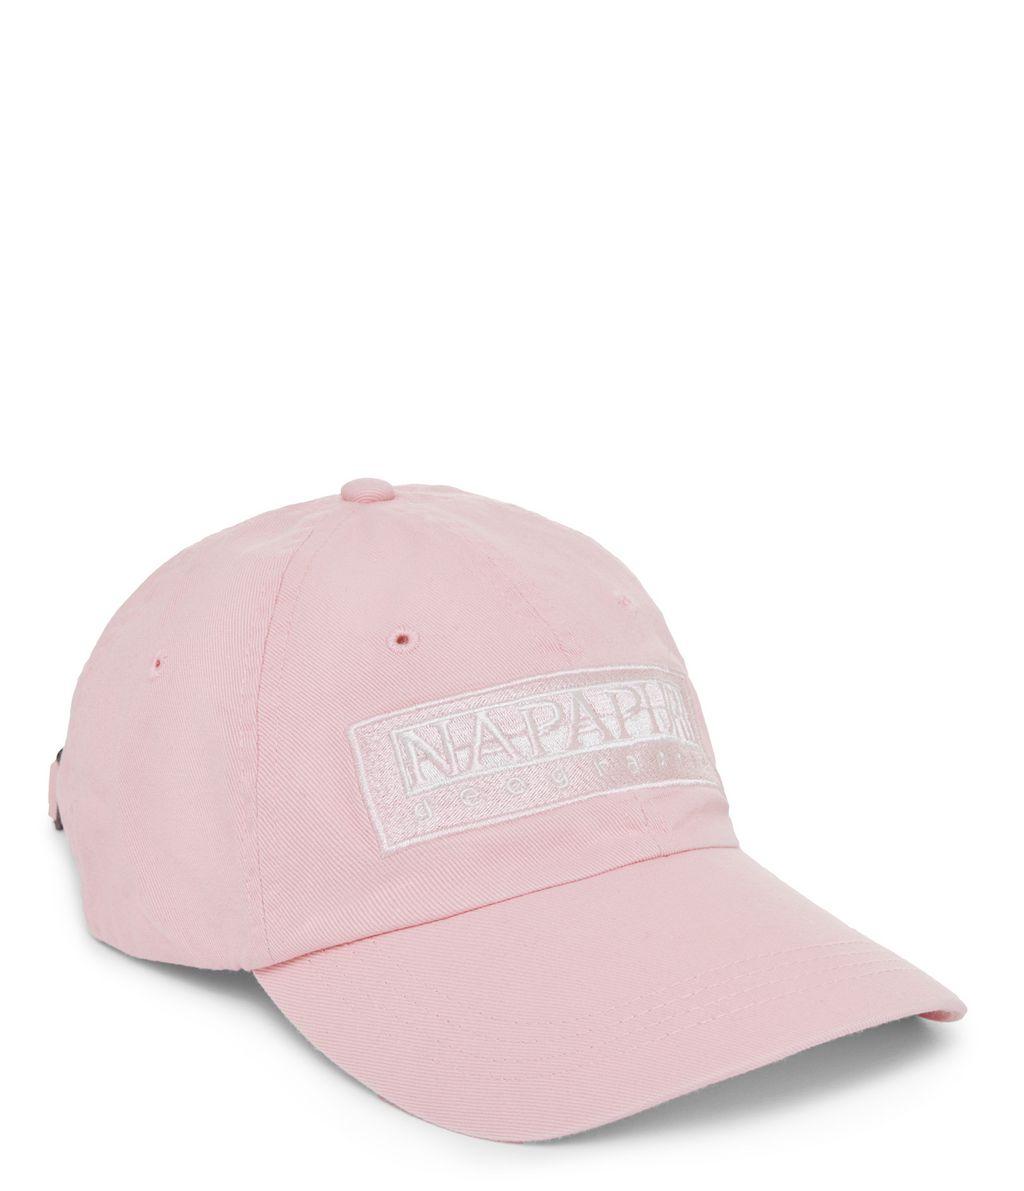 NAPAPIJRI FLON  HAT,LIGHT PINK